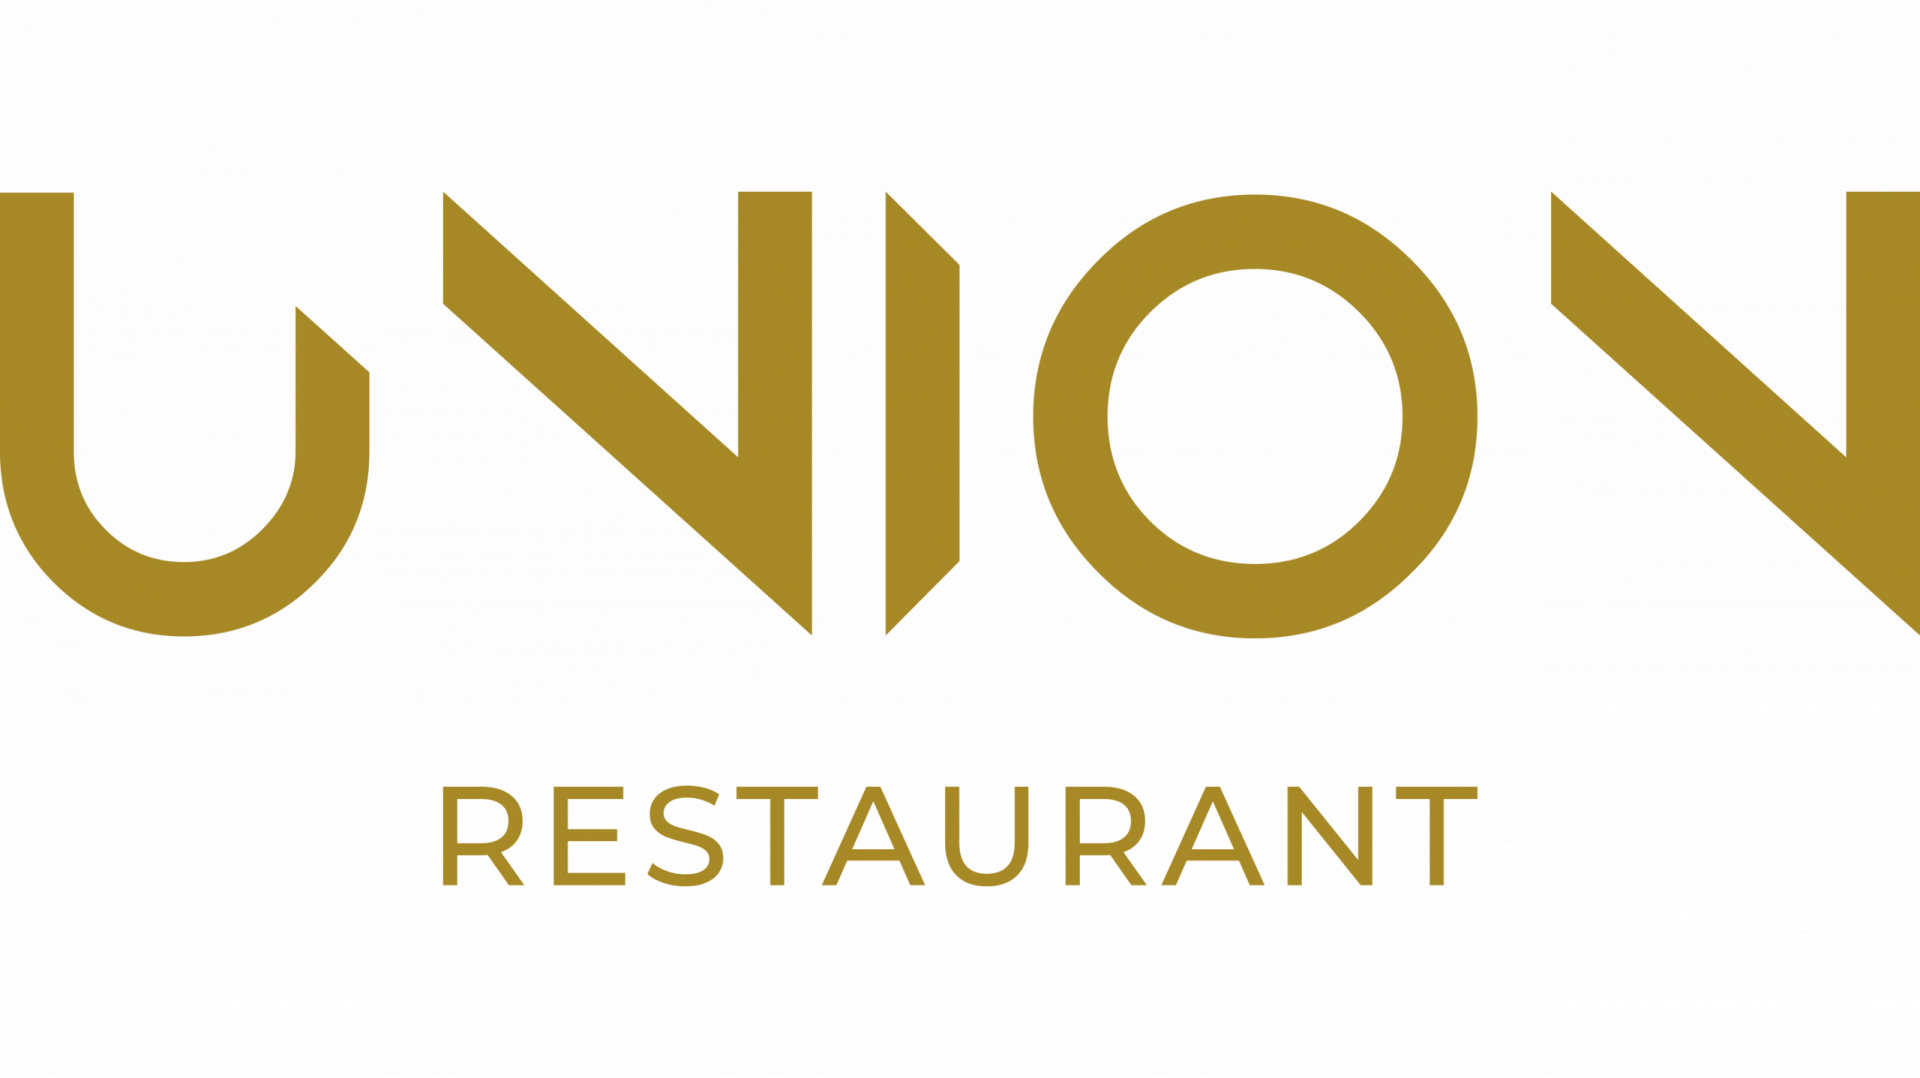 Union Restaurant : Brand Short Description Type Here.